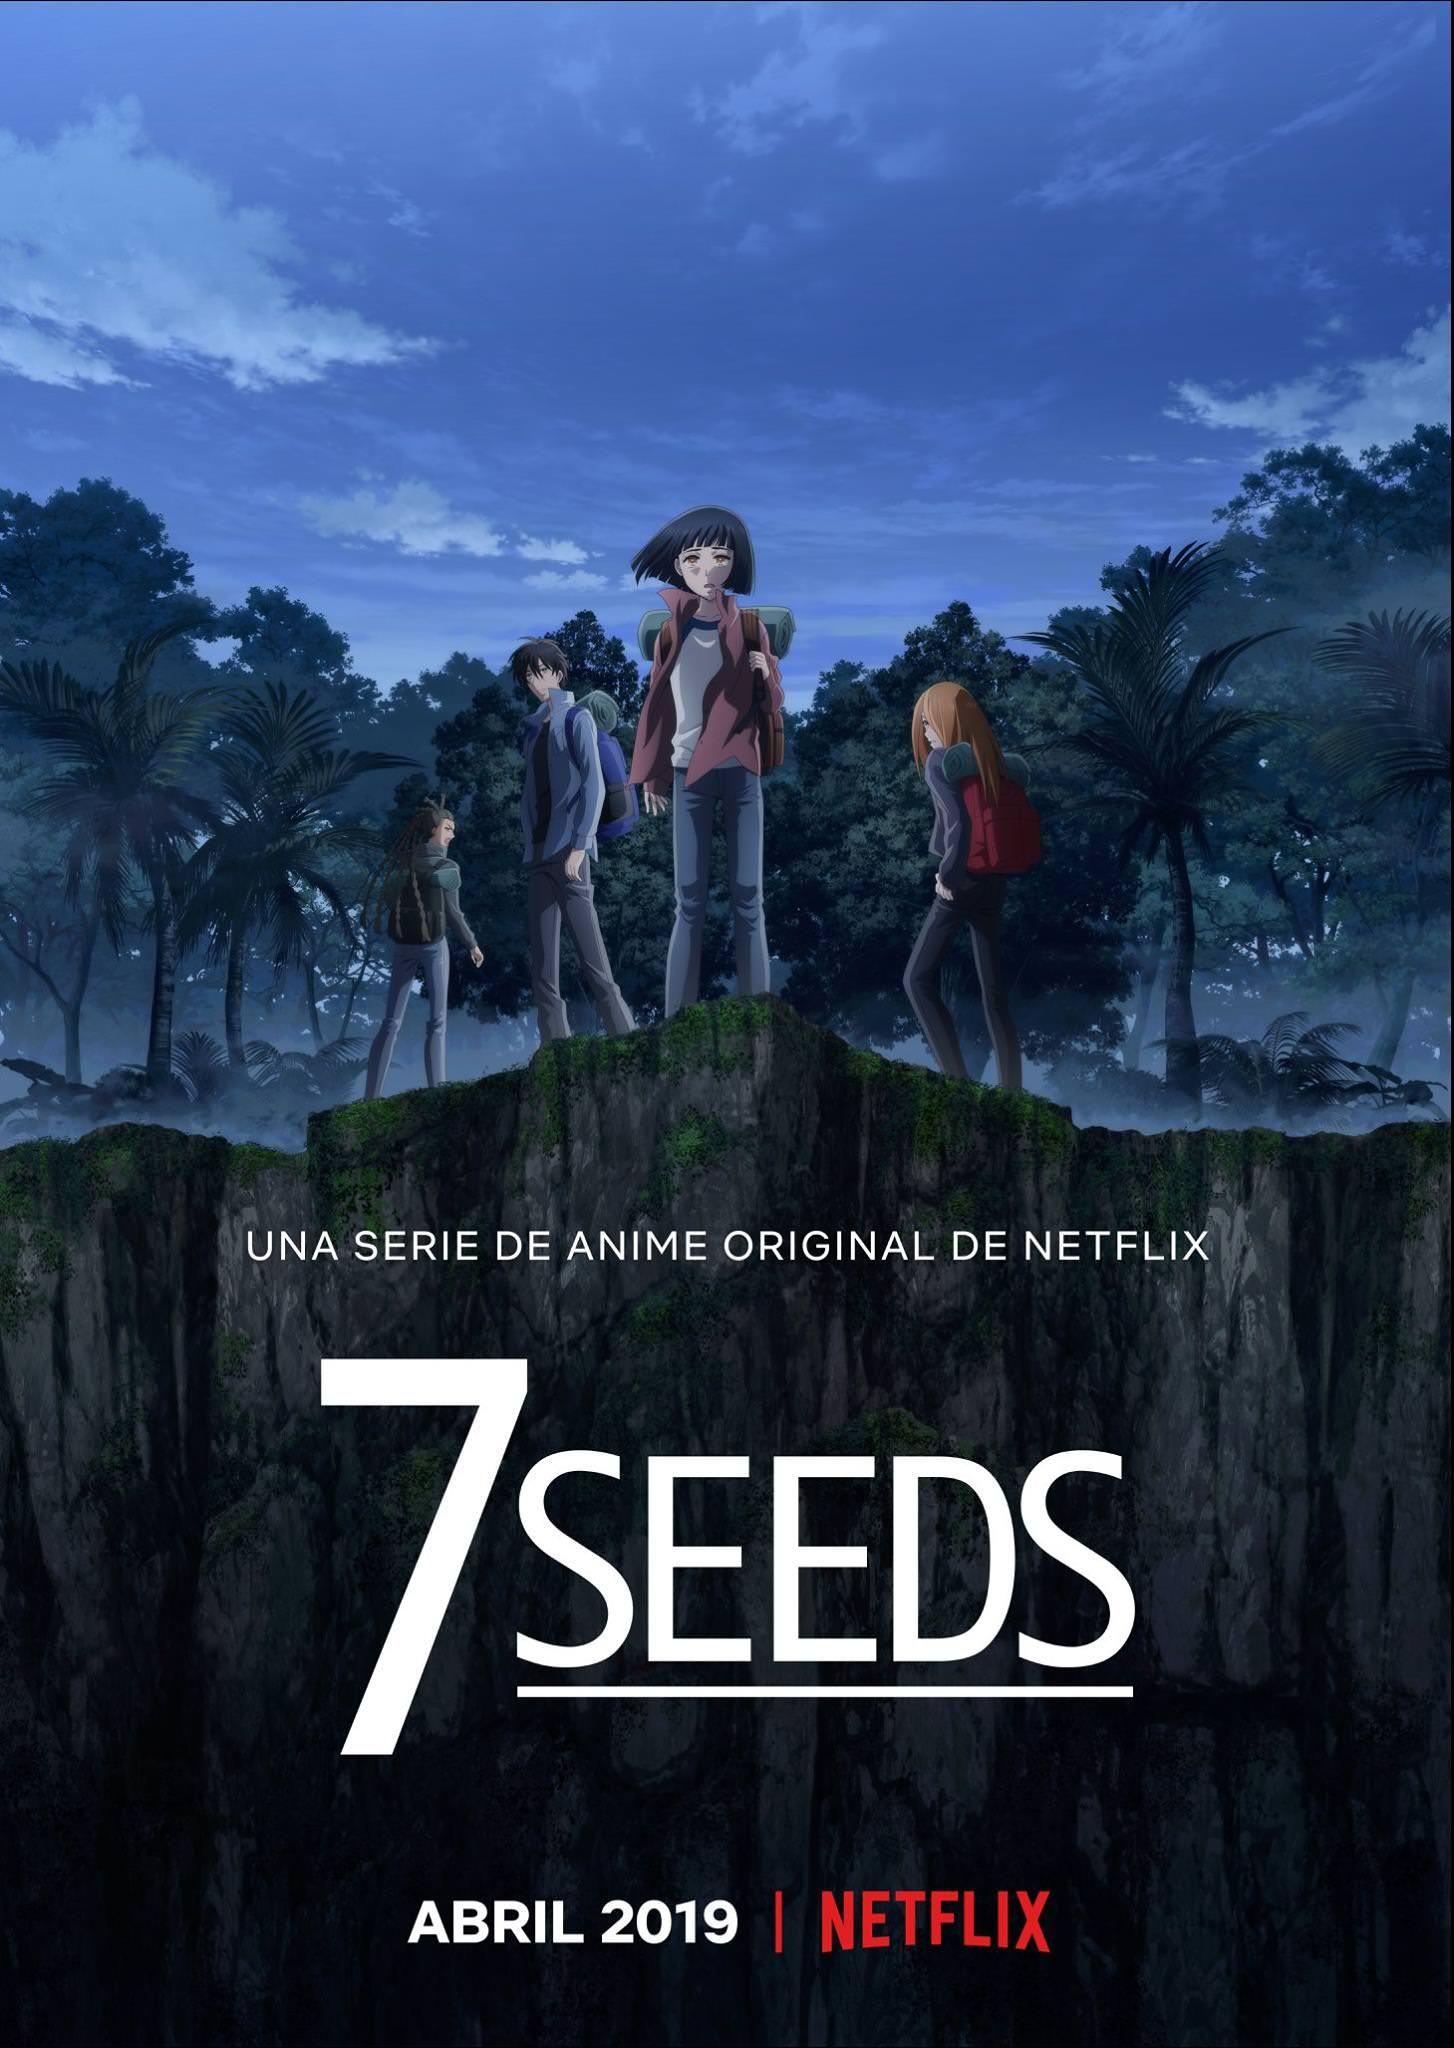 7 SEEDS NETFLIX anuncia sus animes para el 2019